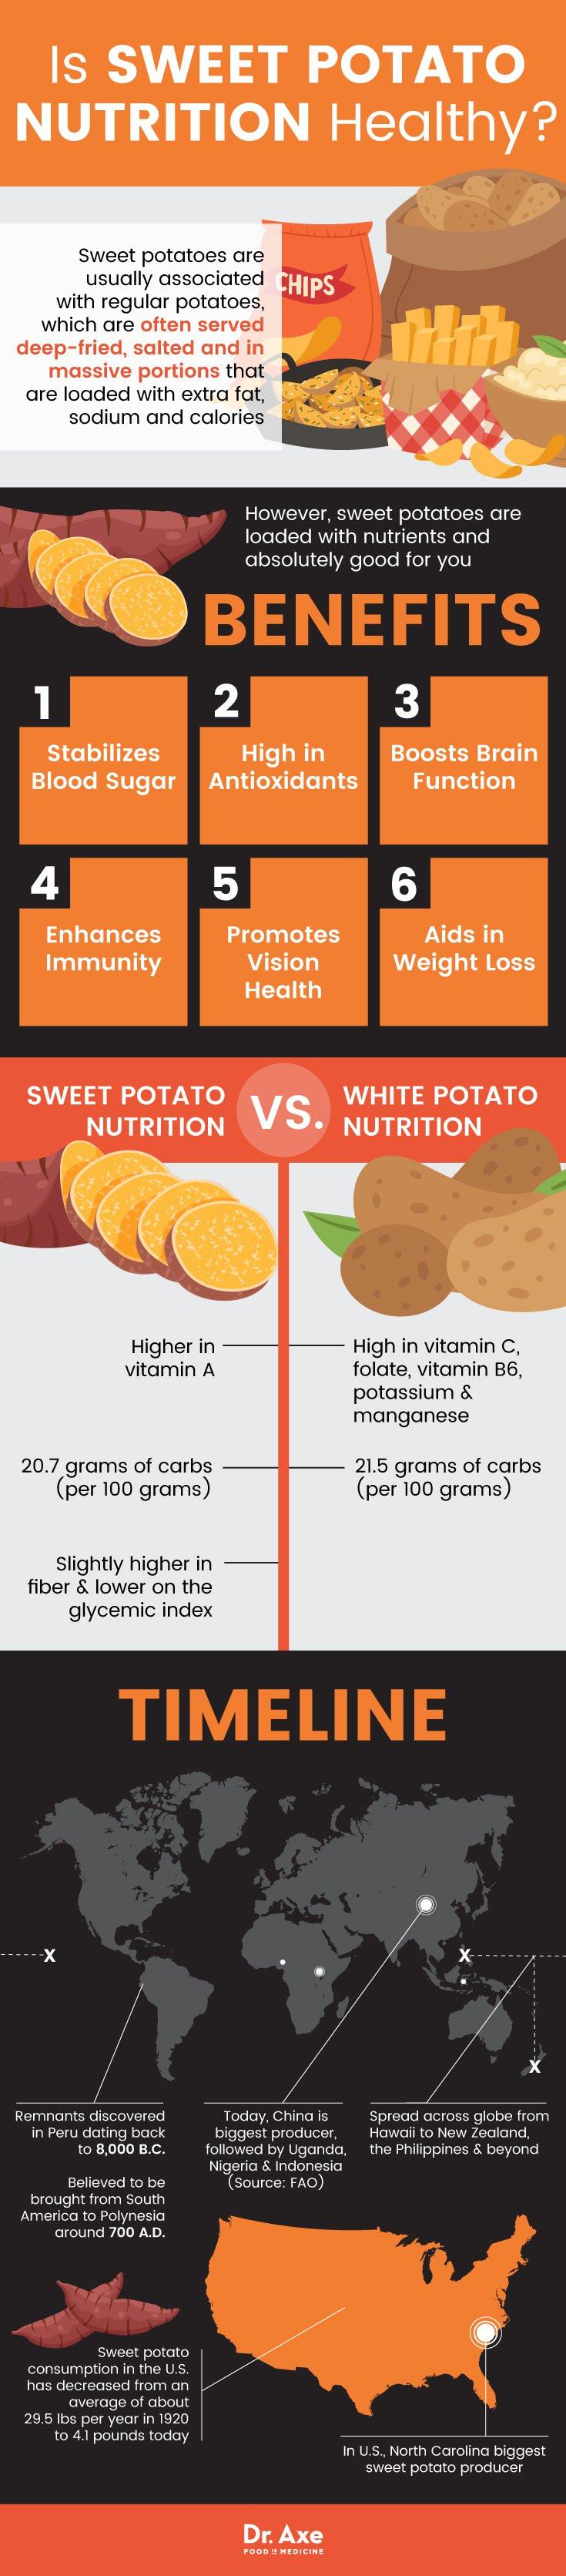 Sweet Potato Nutrition Information  Sweet Potato Nutrition Facts PLUS Benefits DrAxe